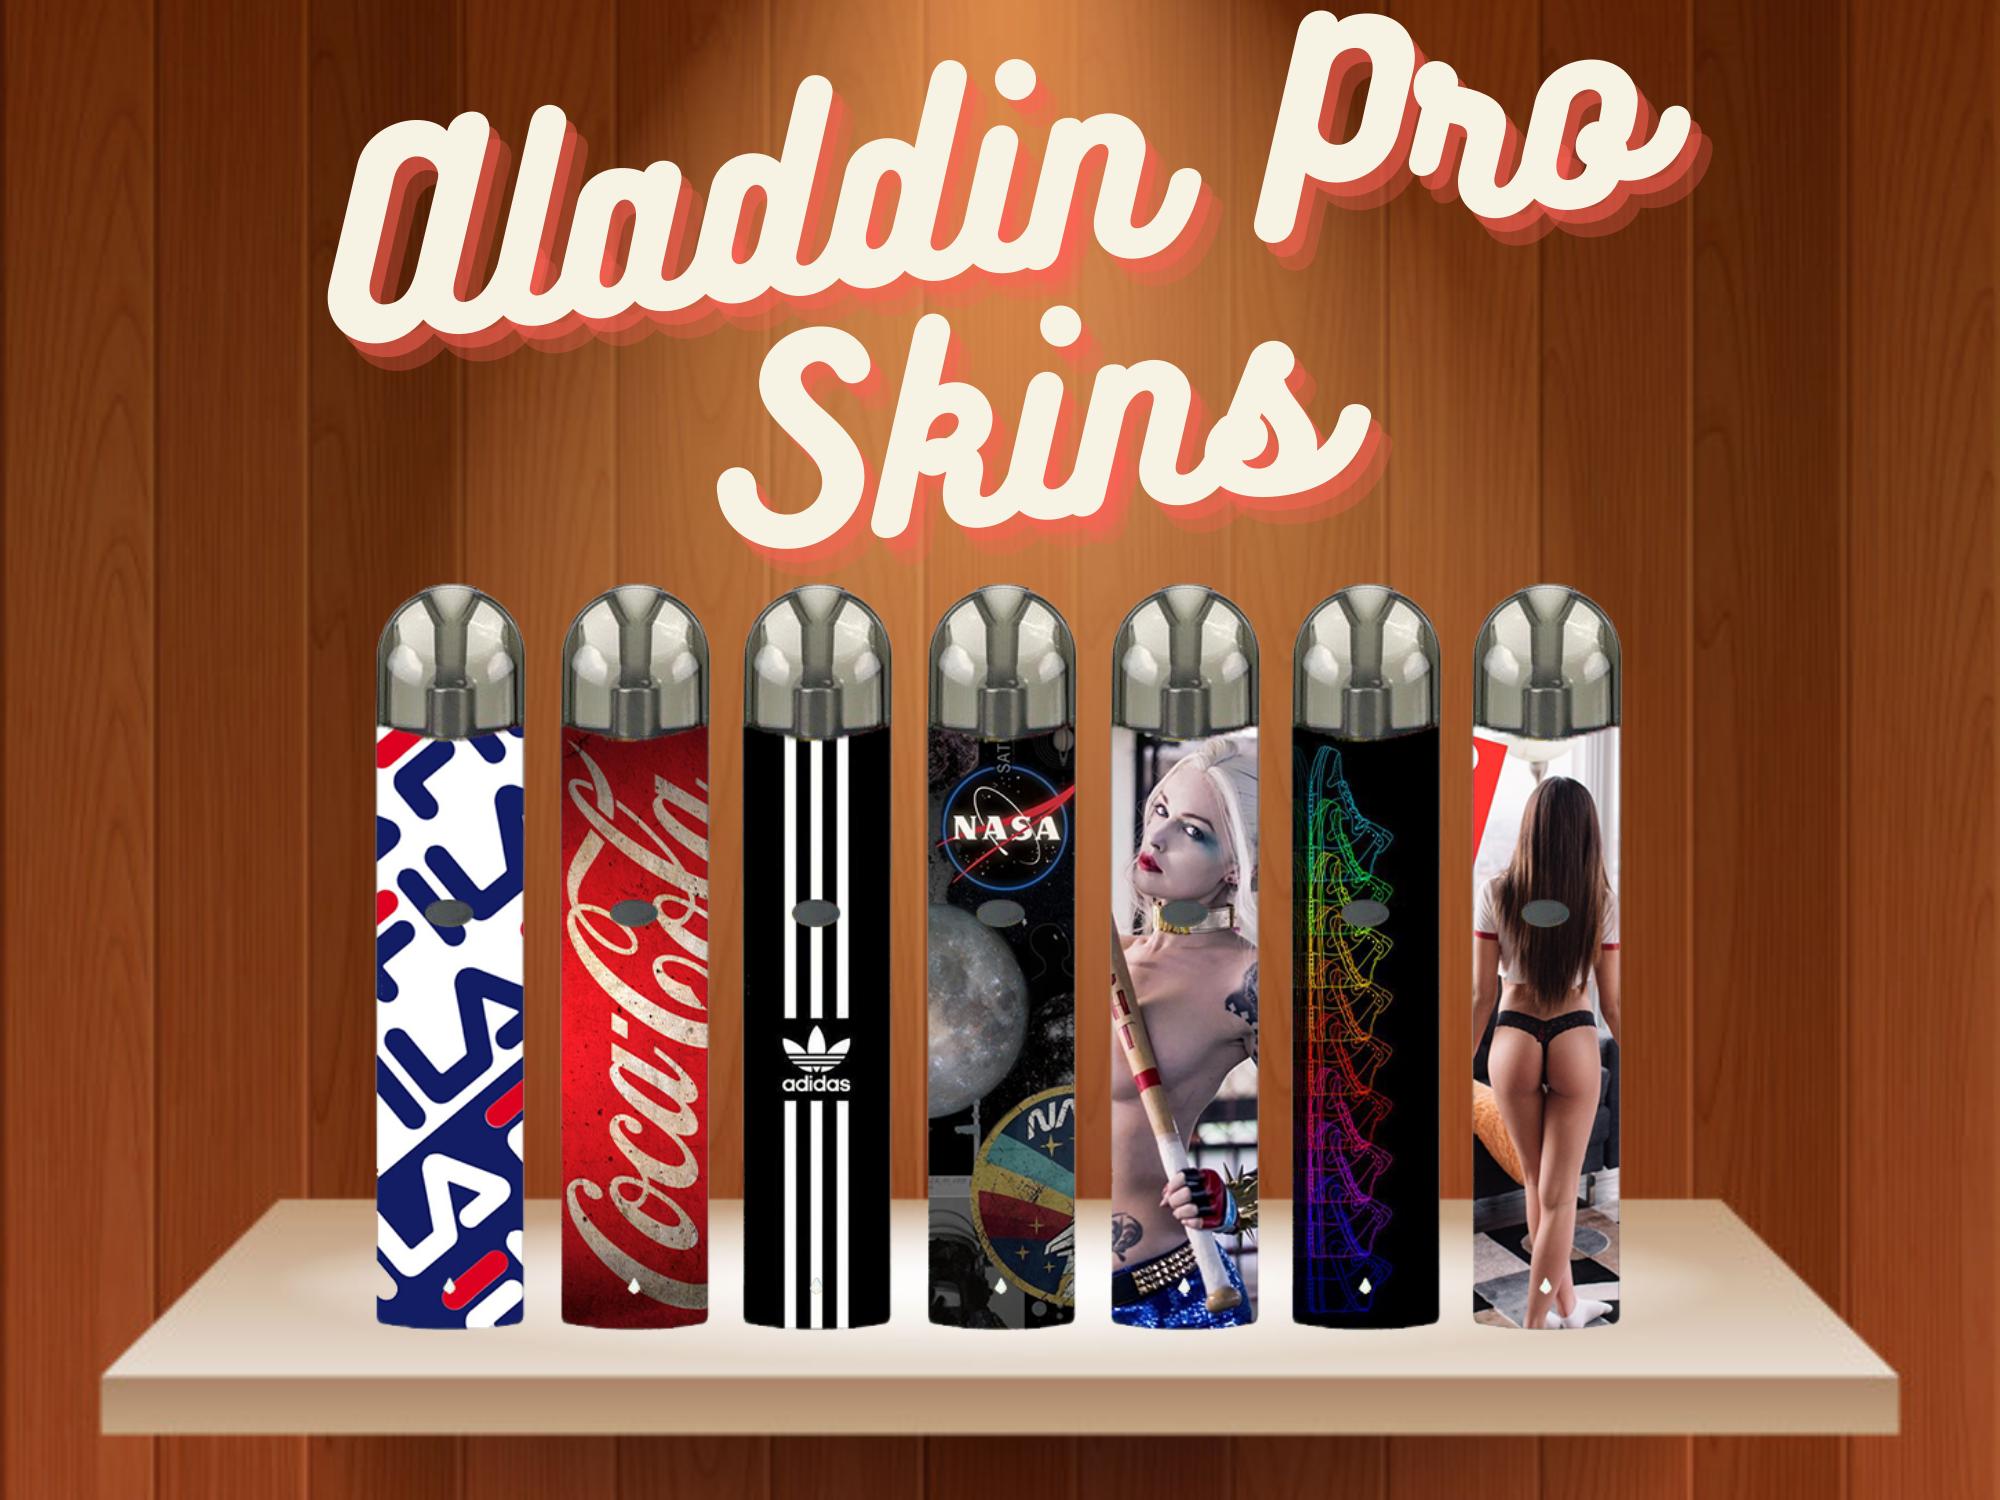 Aladdin Pro